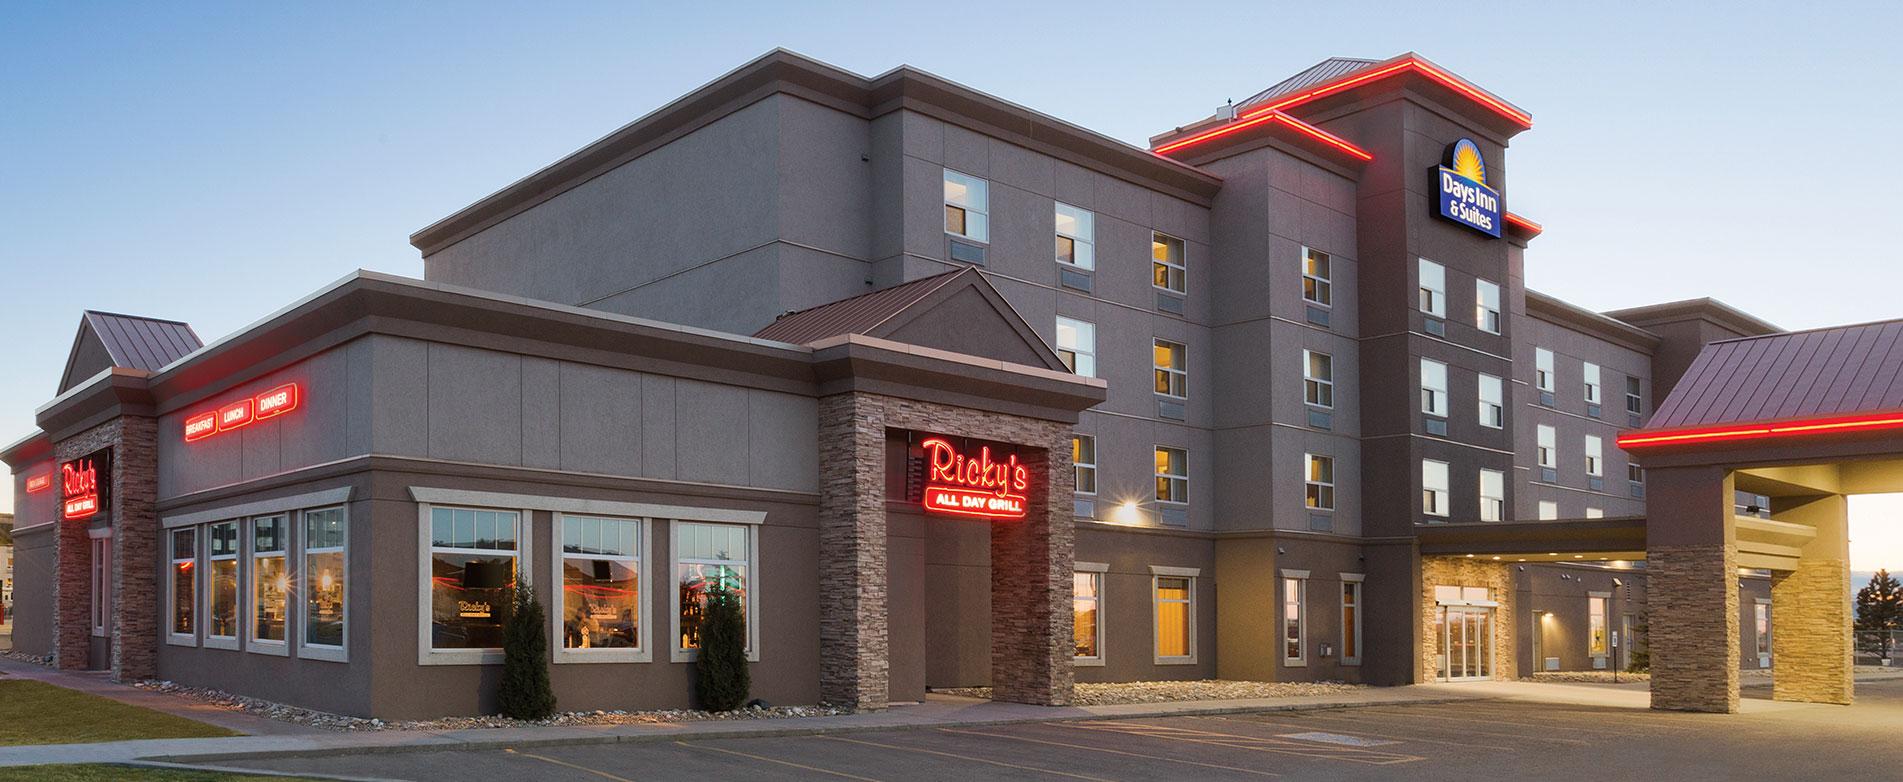 Days Inn Suites South Edmonton Hotels Near Edmonton Airport Ab